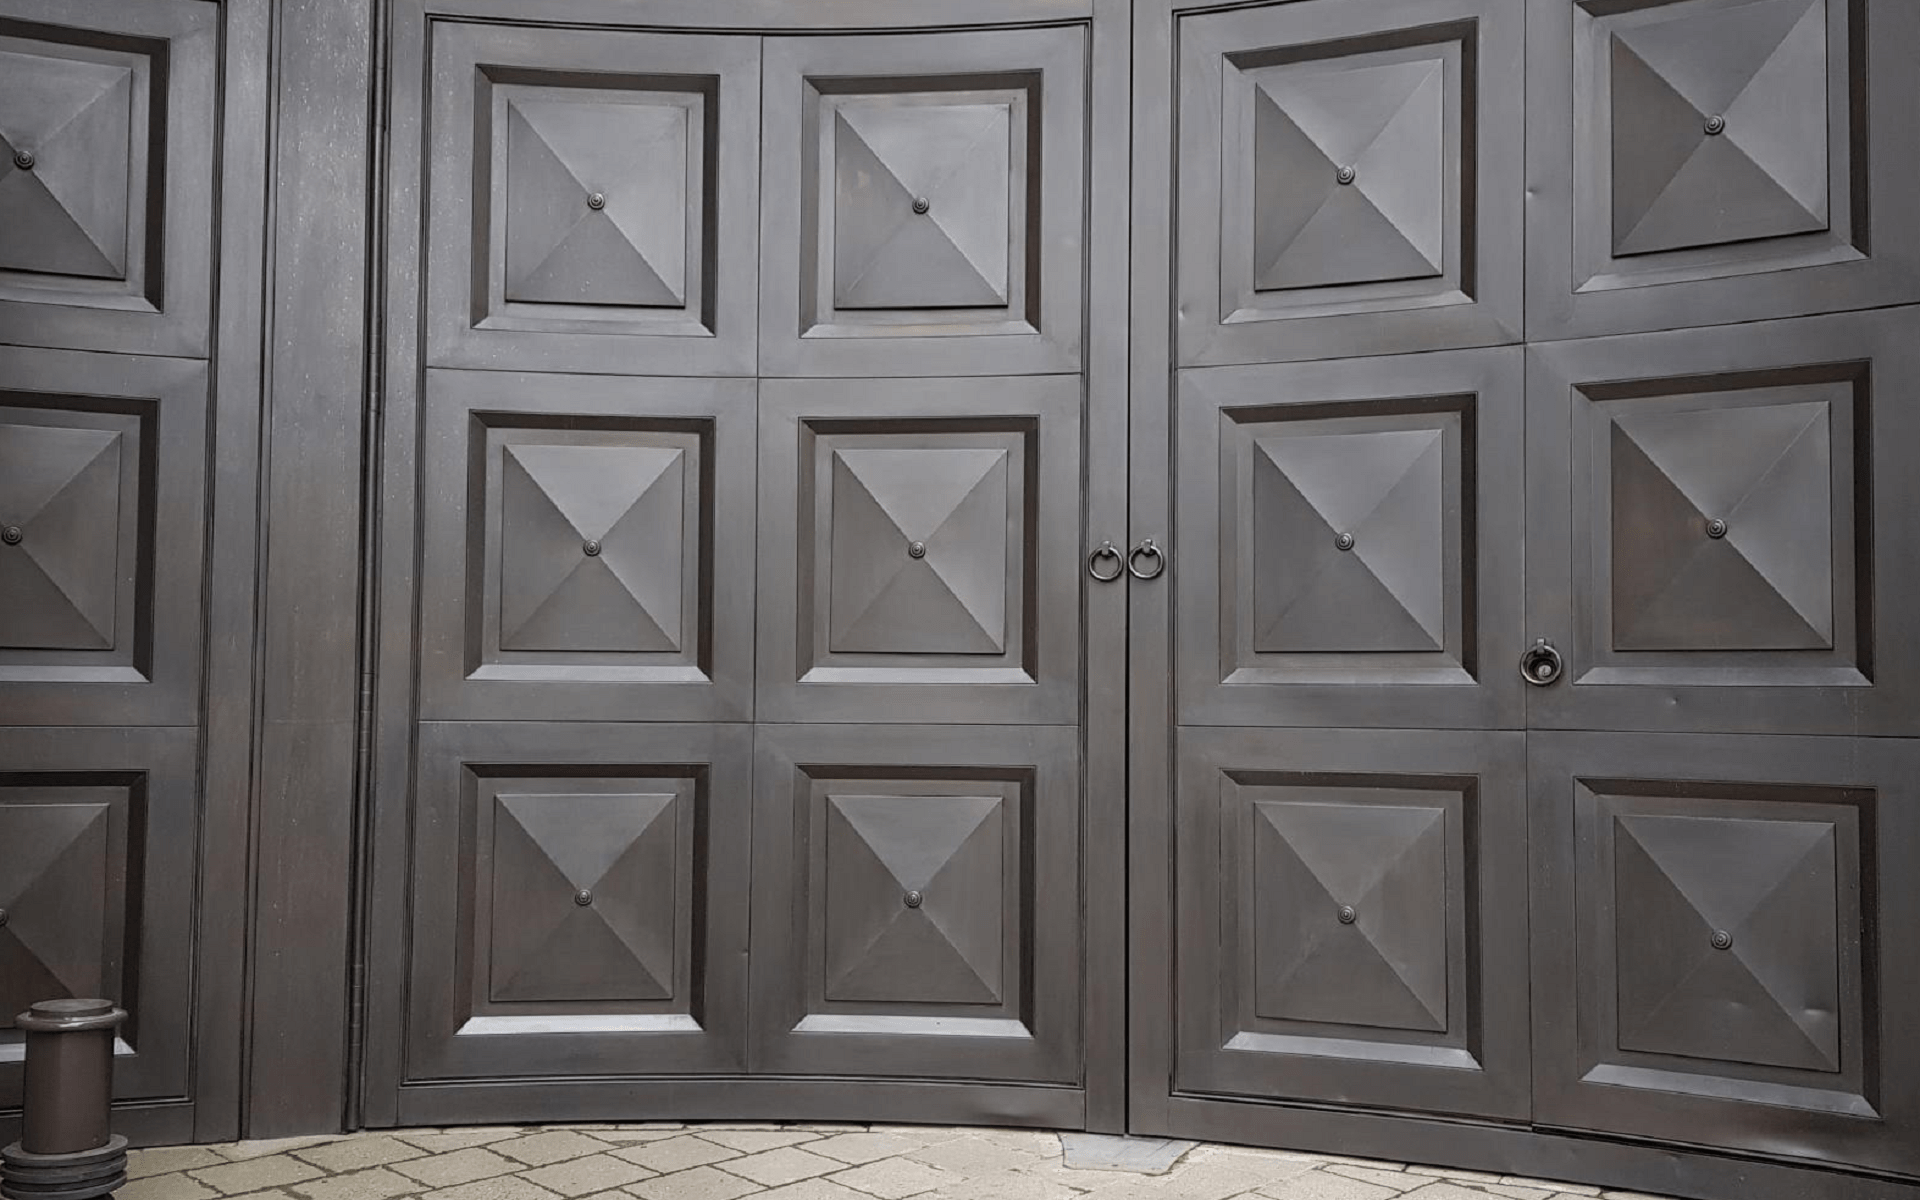 bronze gates patination